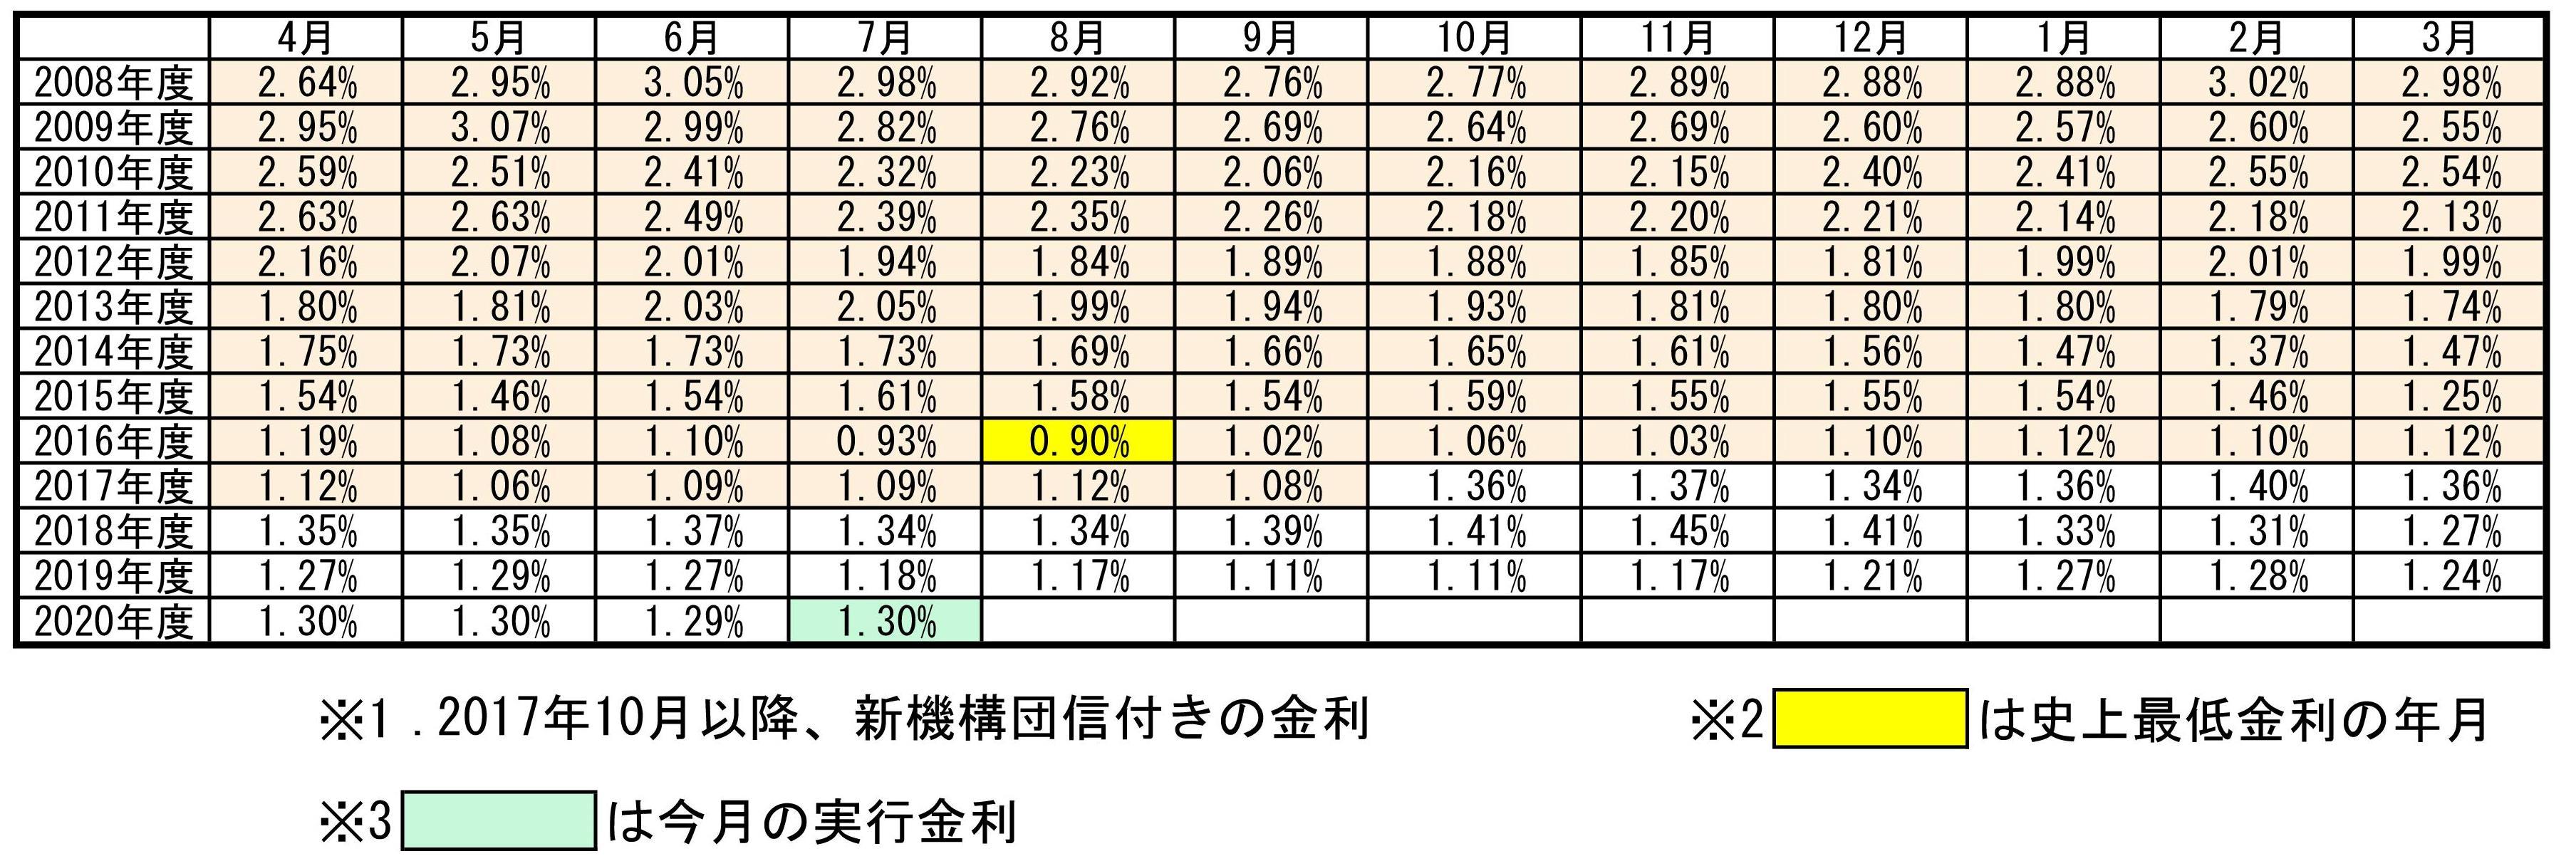 20200701kinri%20%282%29.jpg